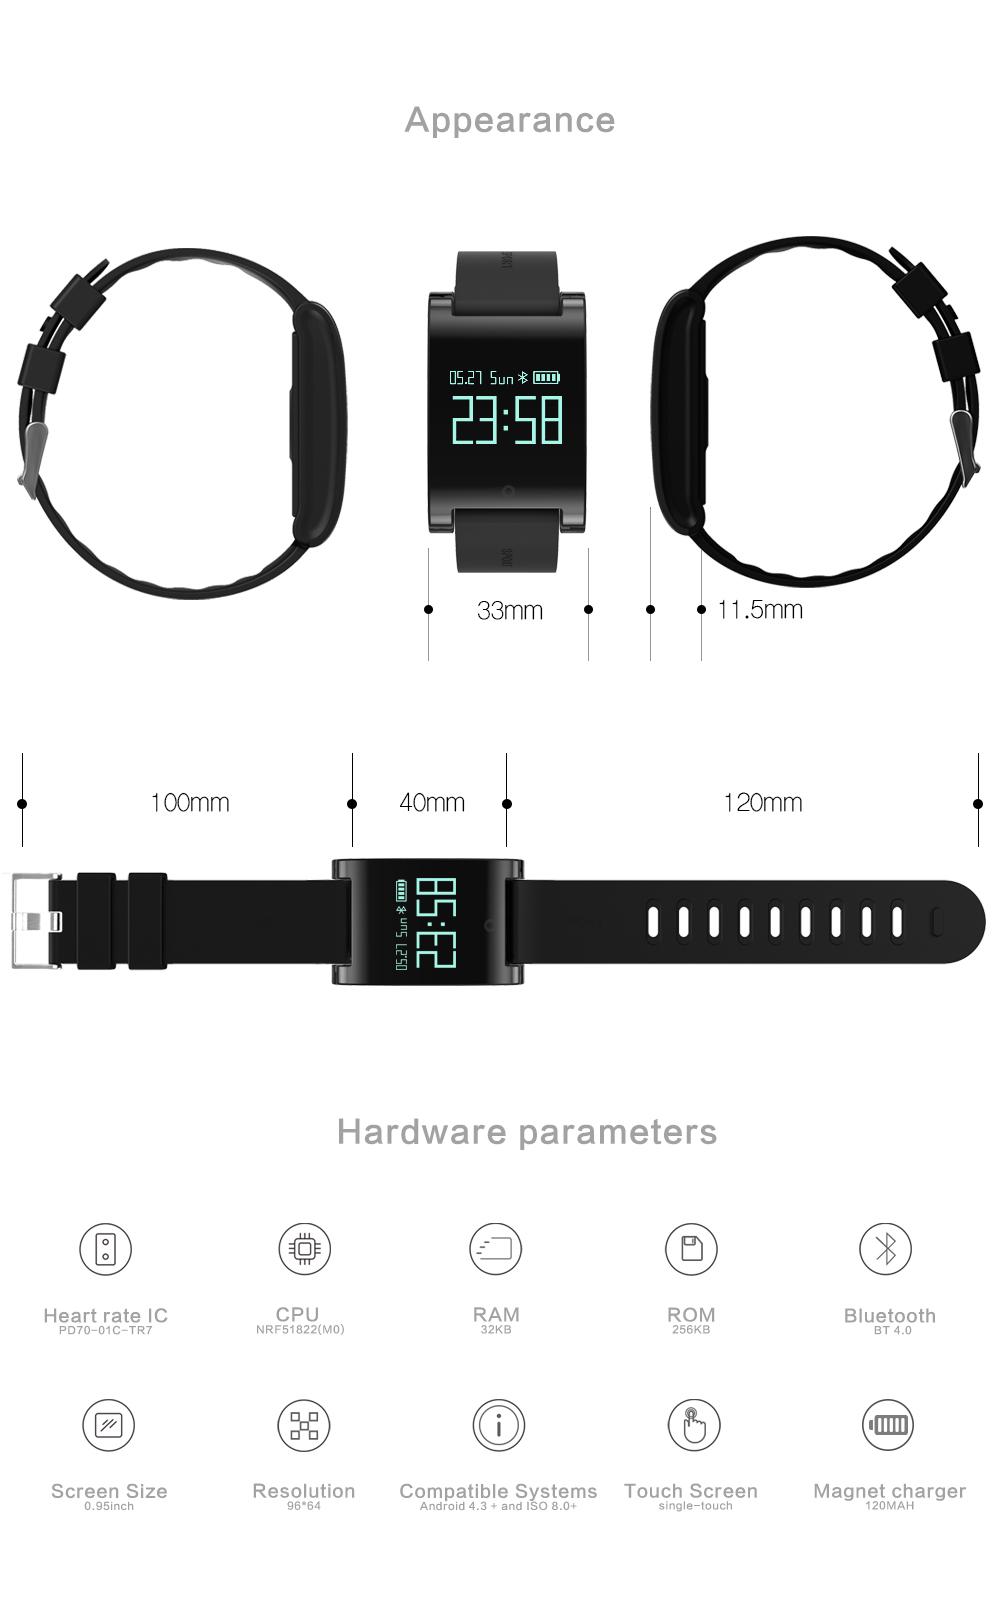 FREZEN Smart Bracelet DM68 Smart Band Fitness Sleep Activity Tracker Blood Pressure Oxygen Heart Rate Tracker For Android IOS 16